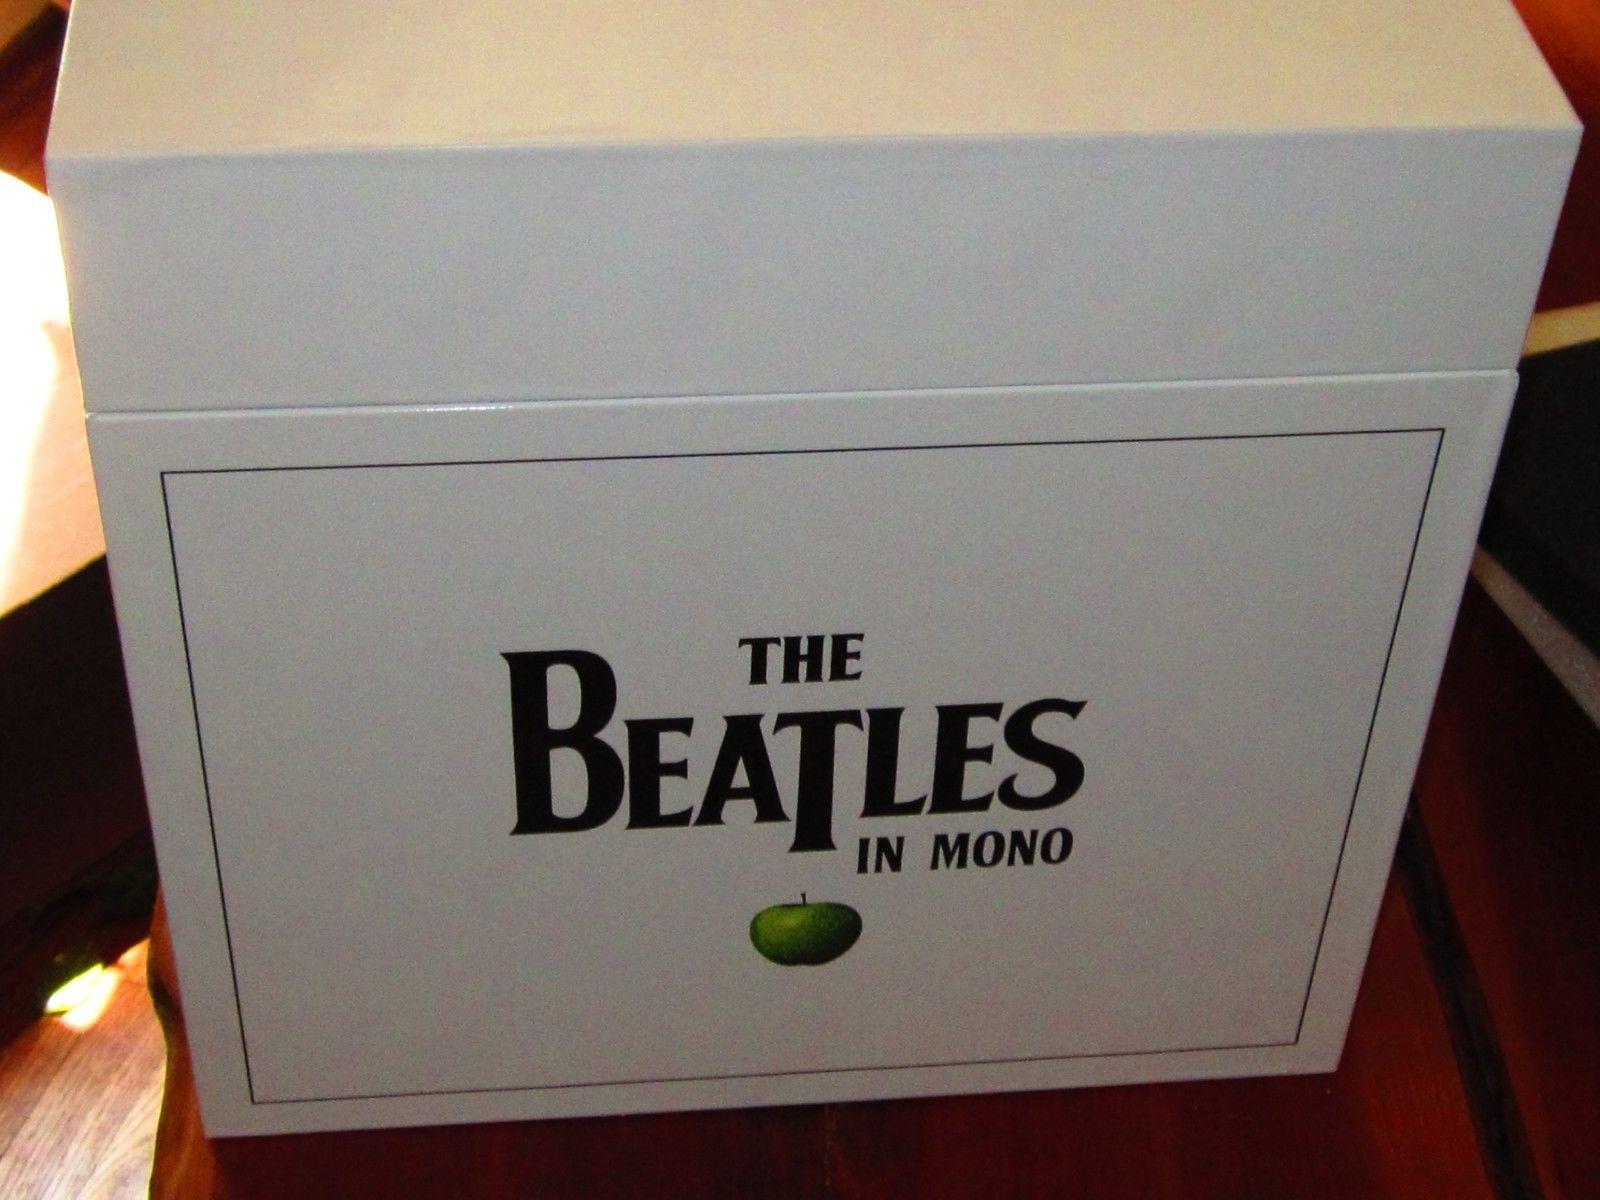 popsike com - THE BEATLES IN MONO VINYL RECORDS BOX SET